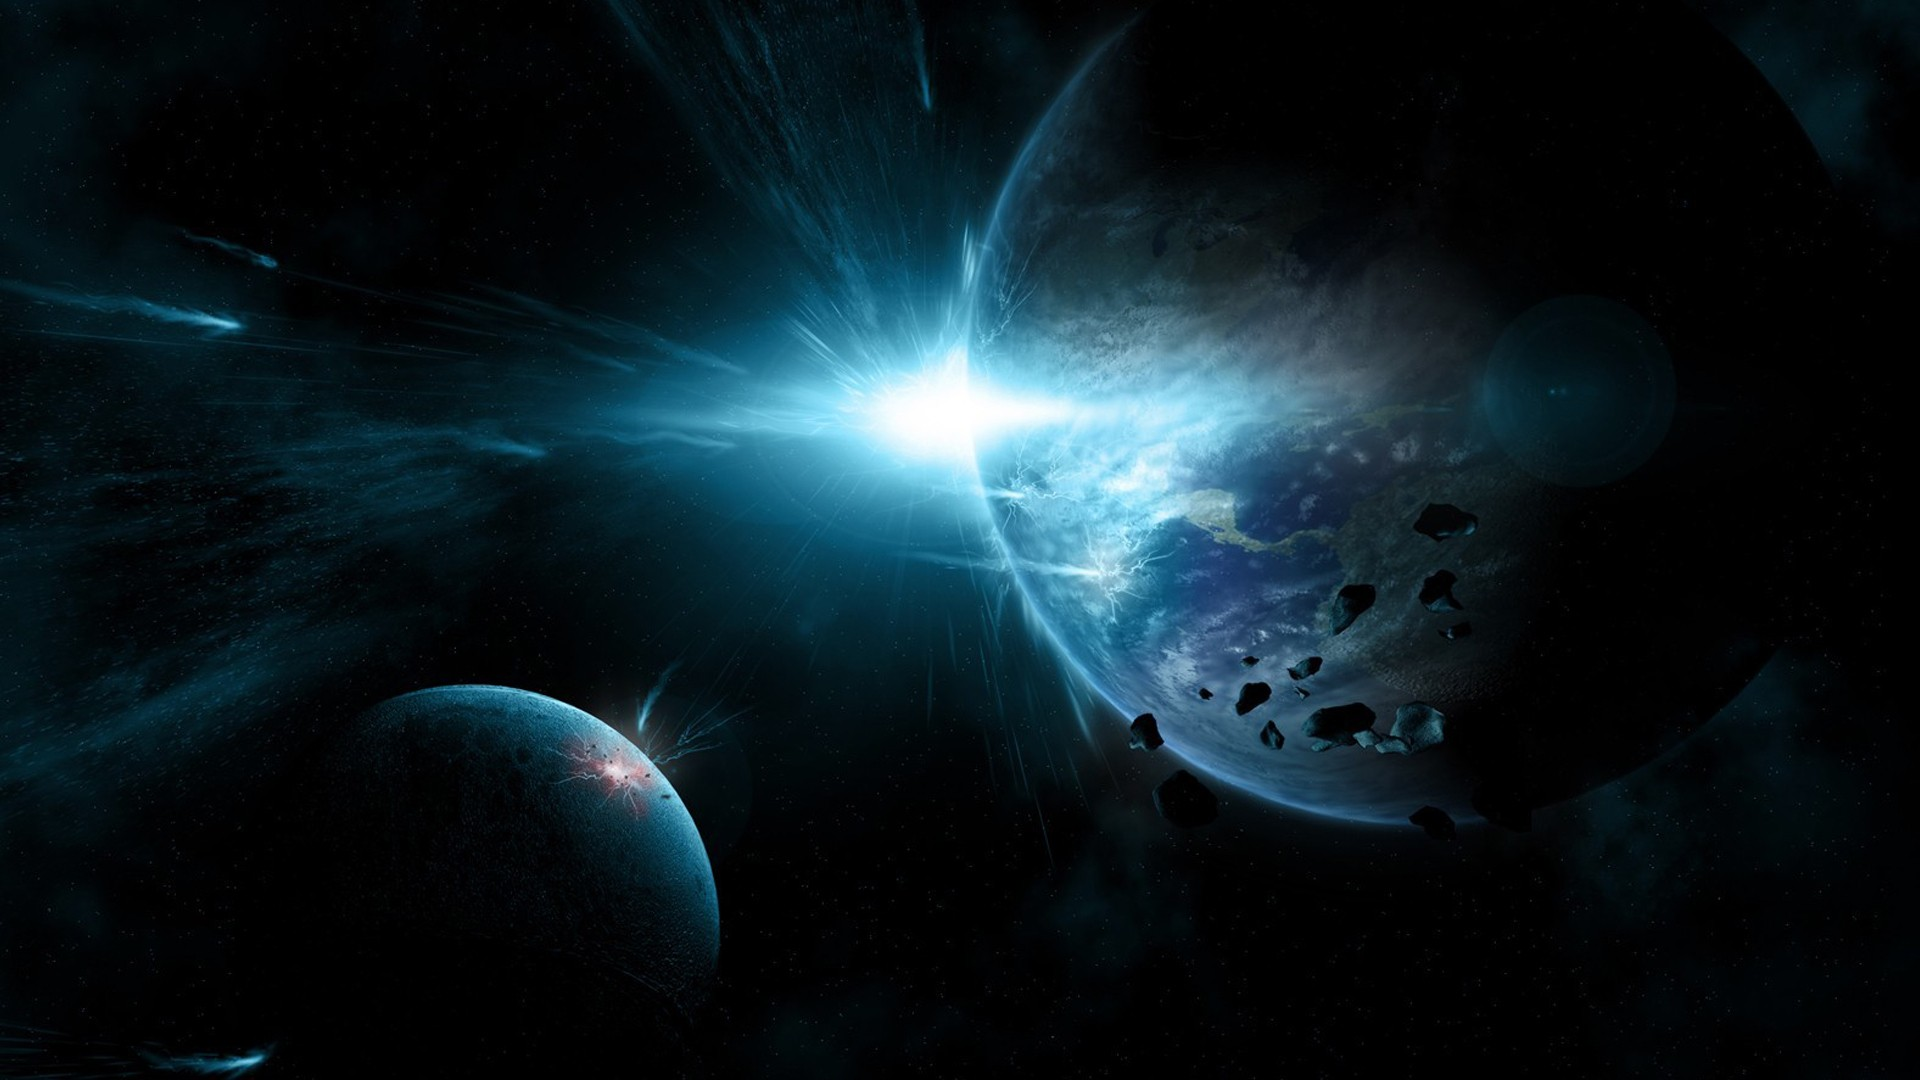 Fantasy Art Planets